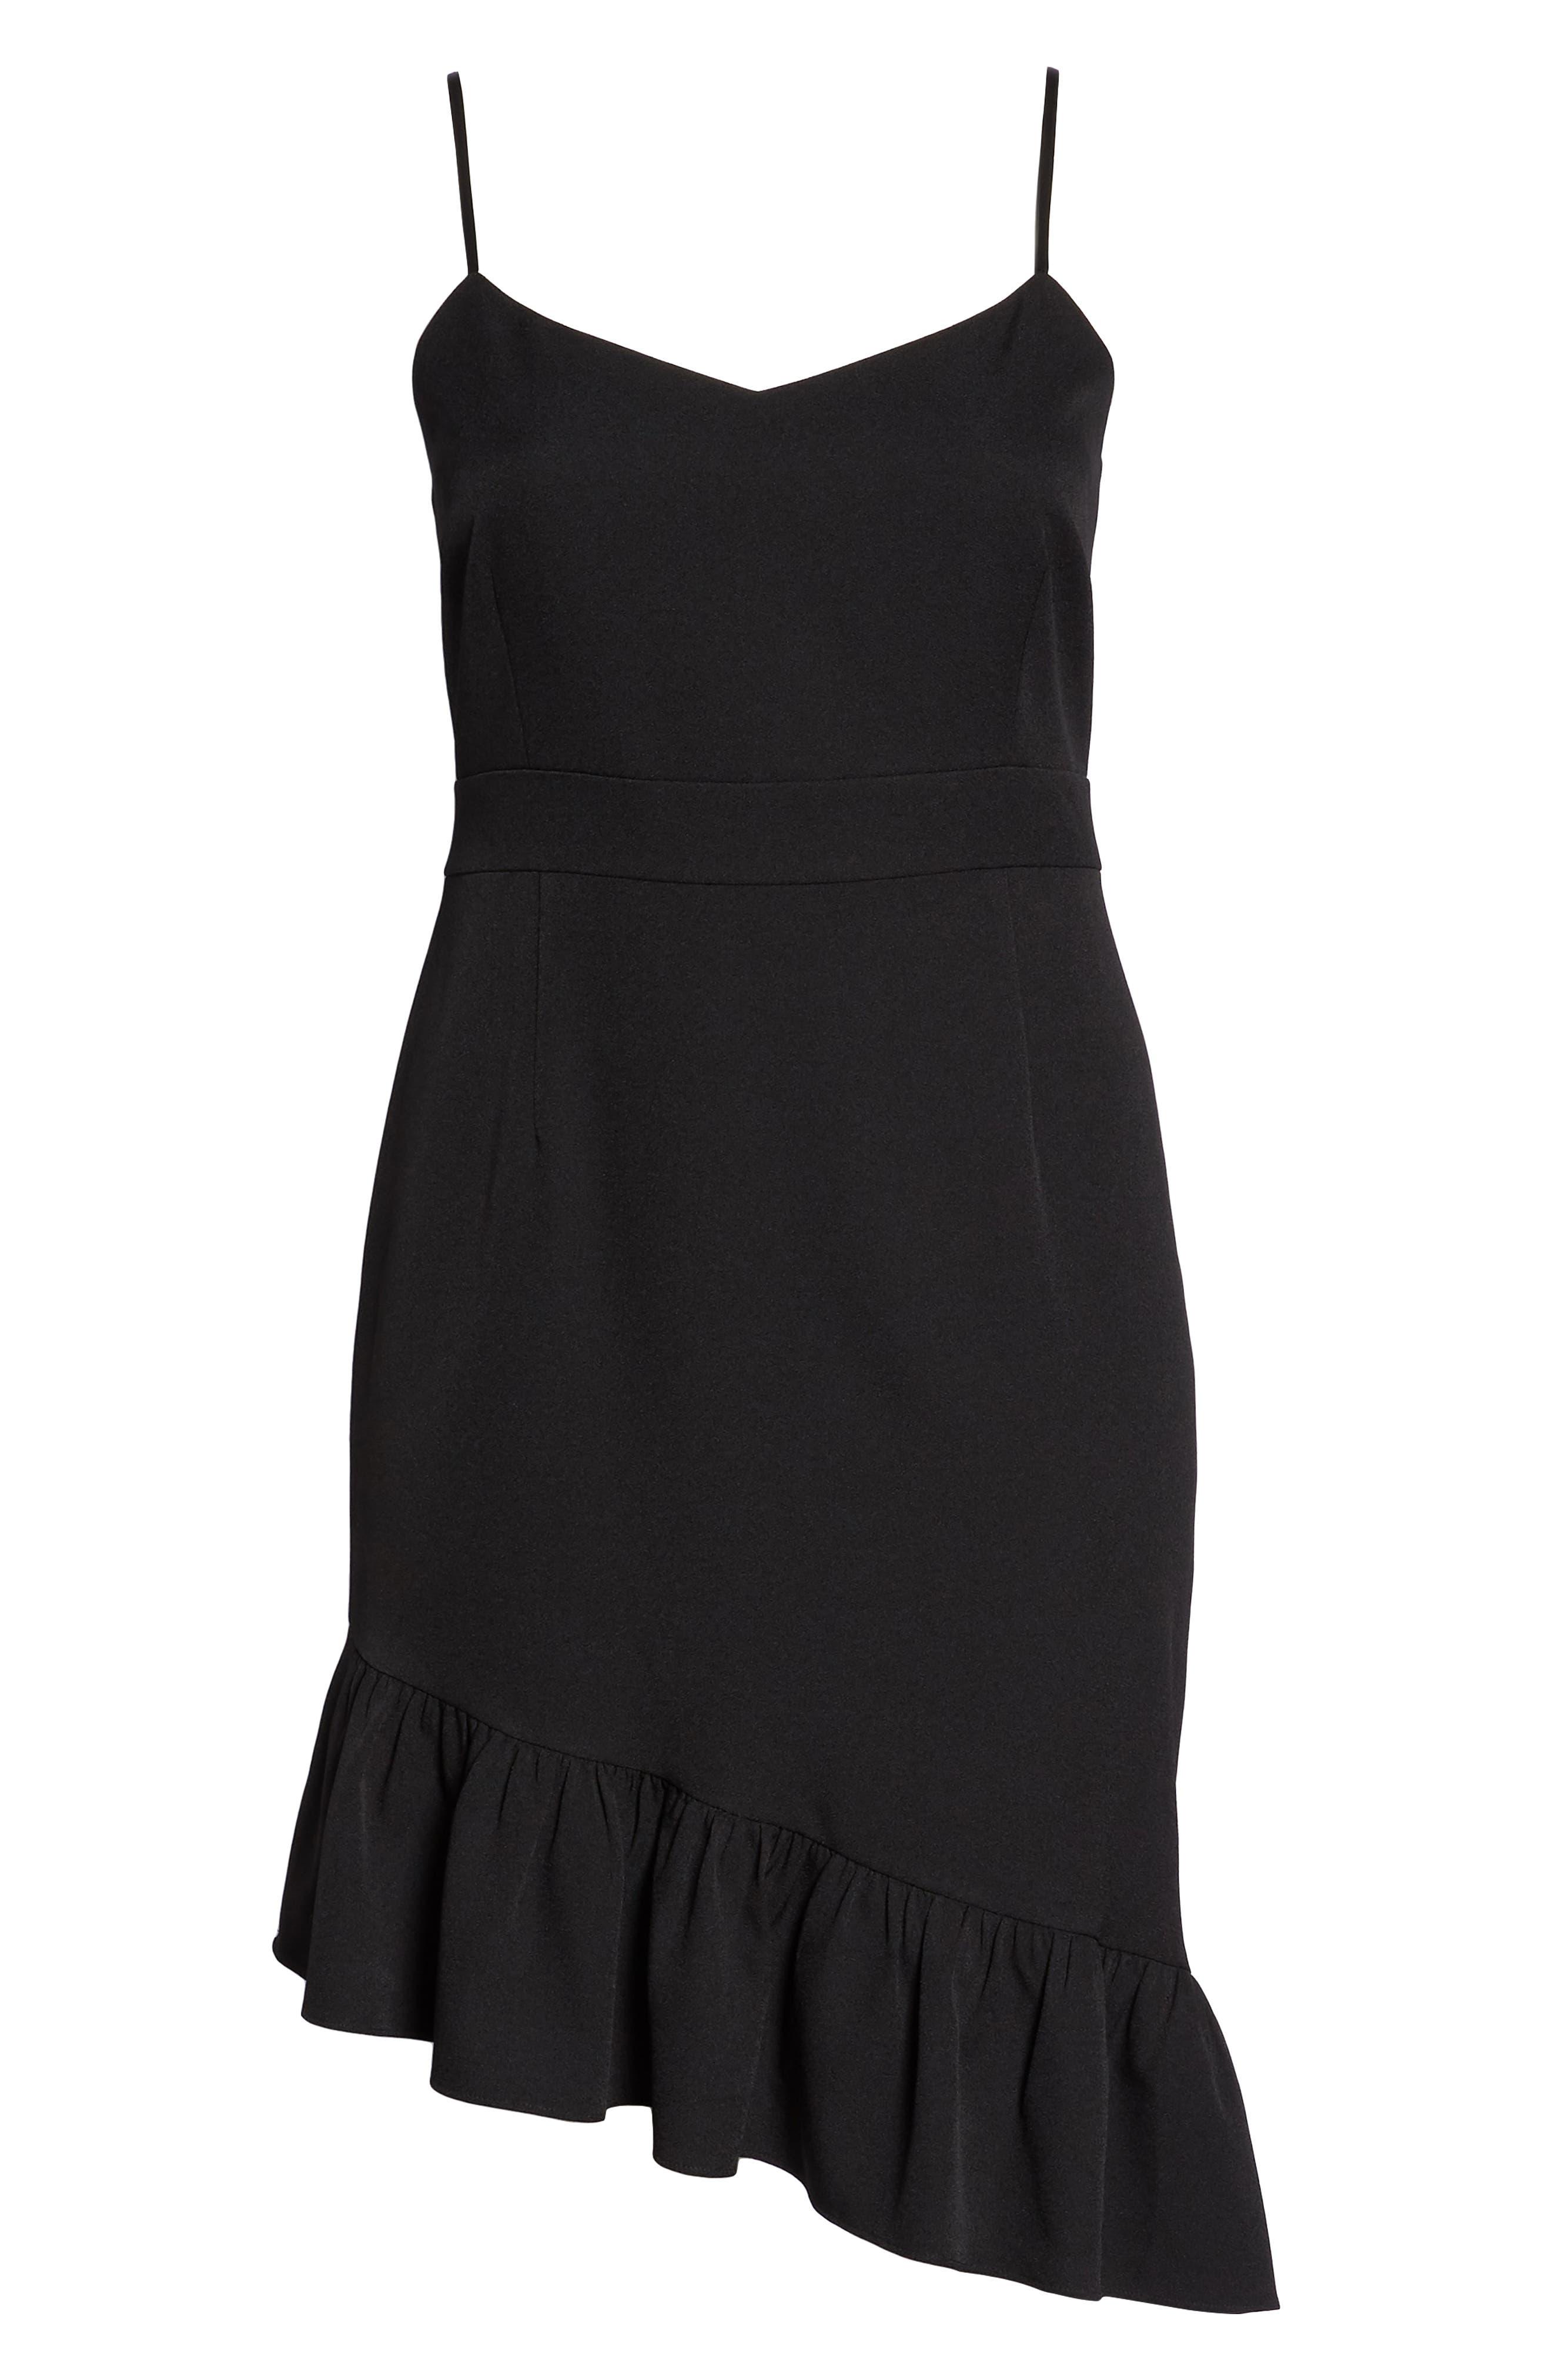 Asymmetric Ruffle Hem Dress,                             Alternate thumbnail 13, color,                             001